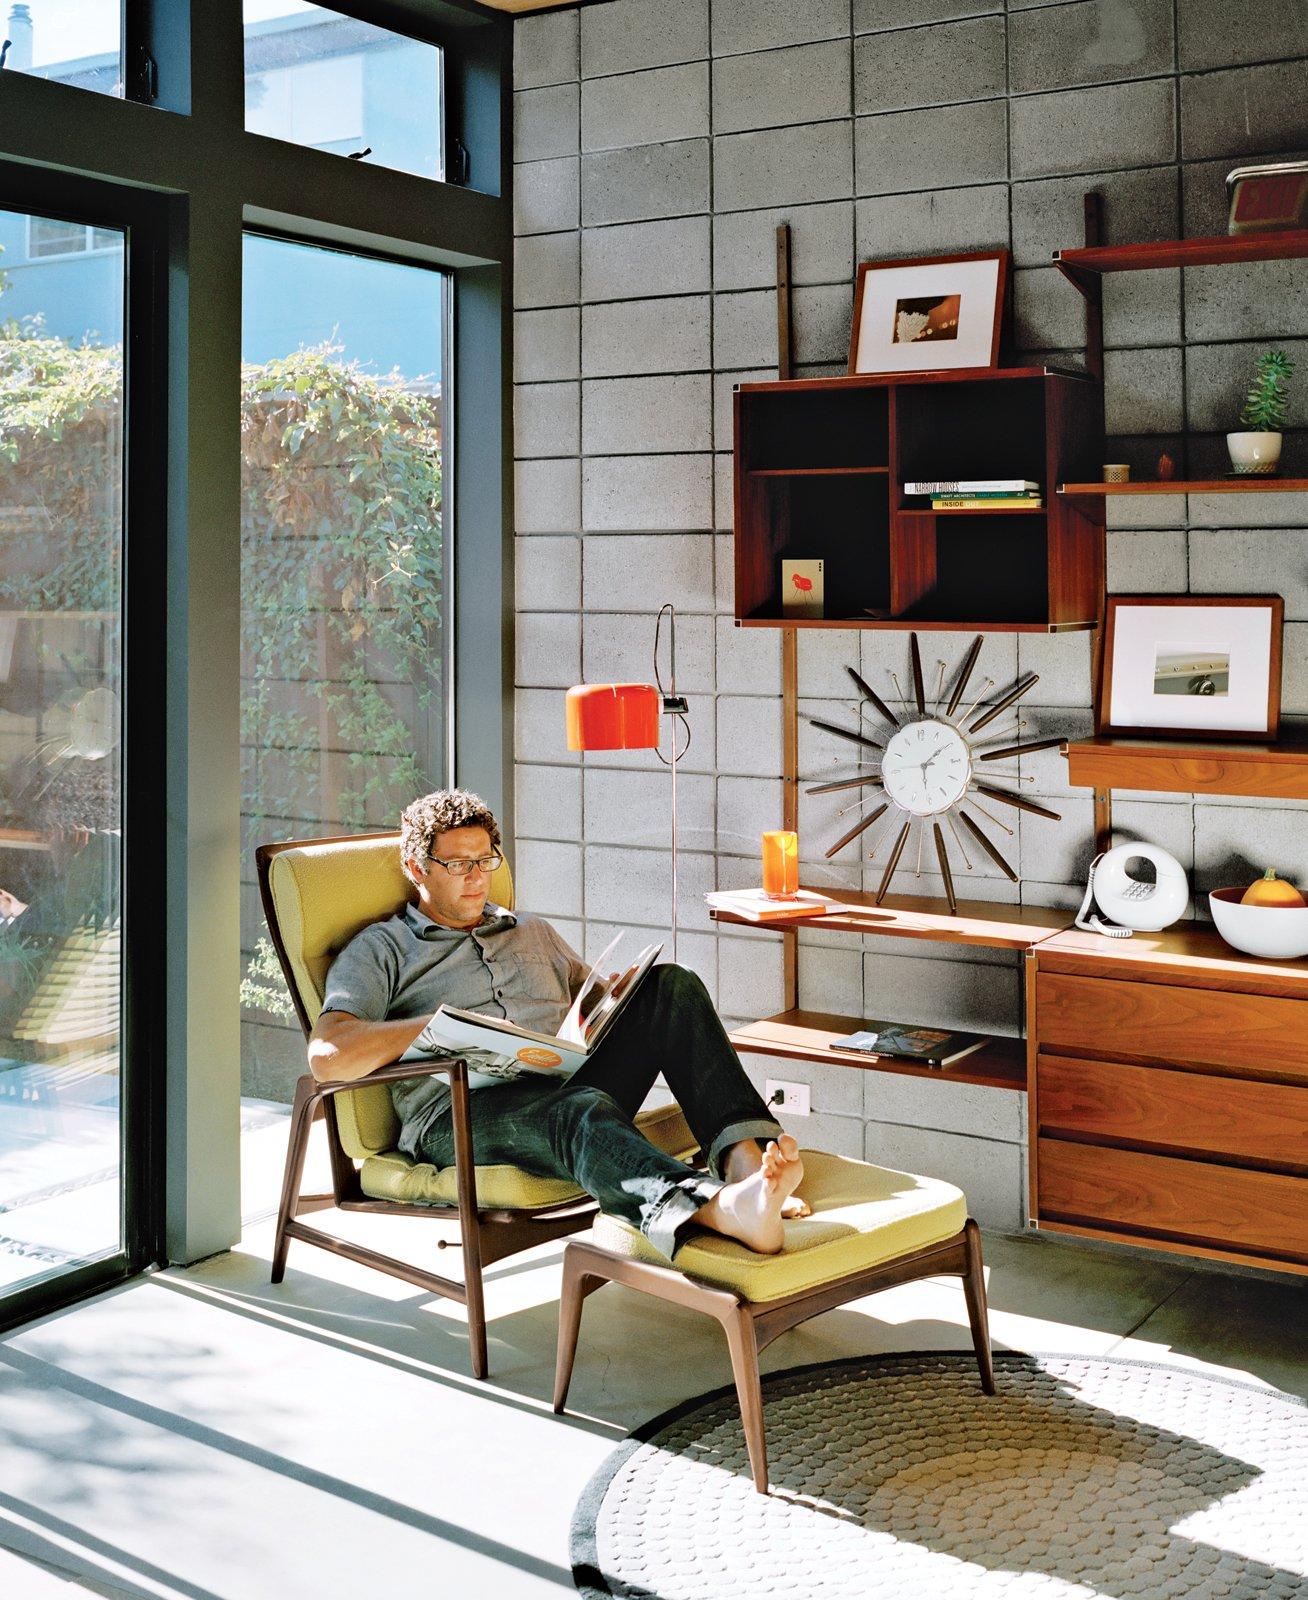 #midcenturymodern #lounge #chair #livingrooms #light